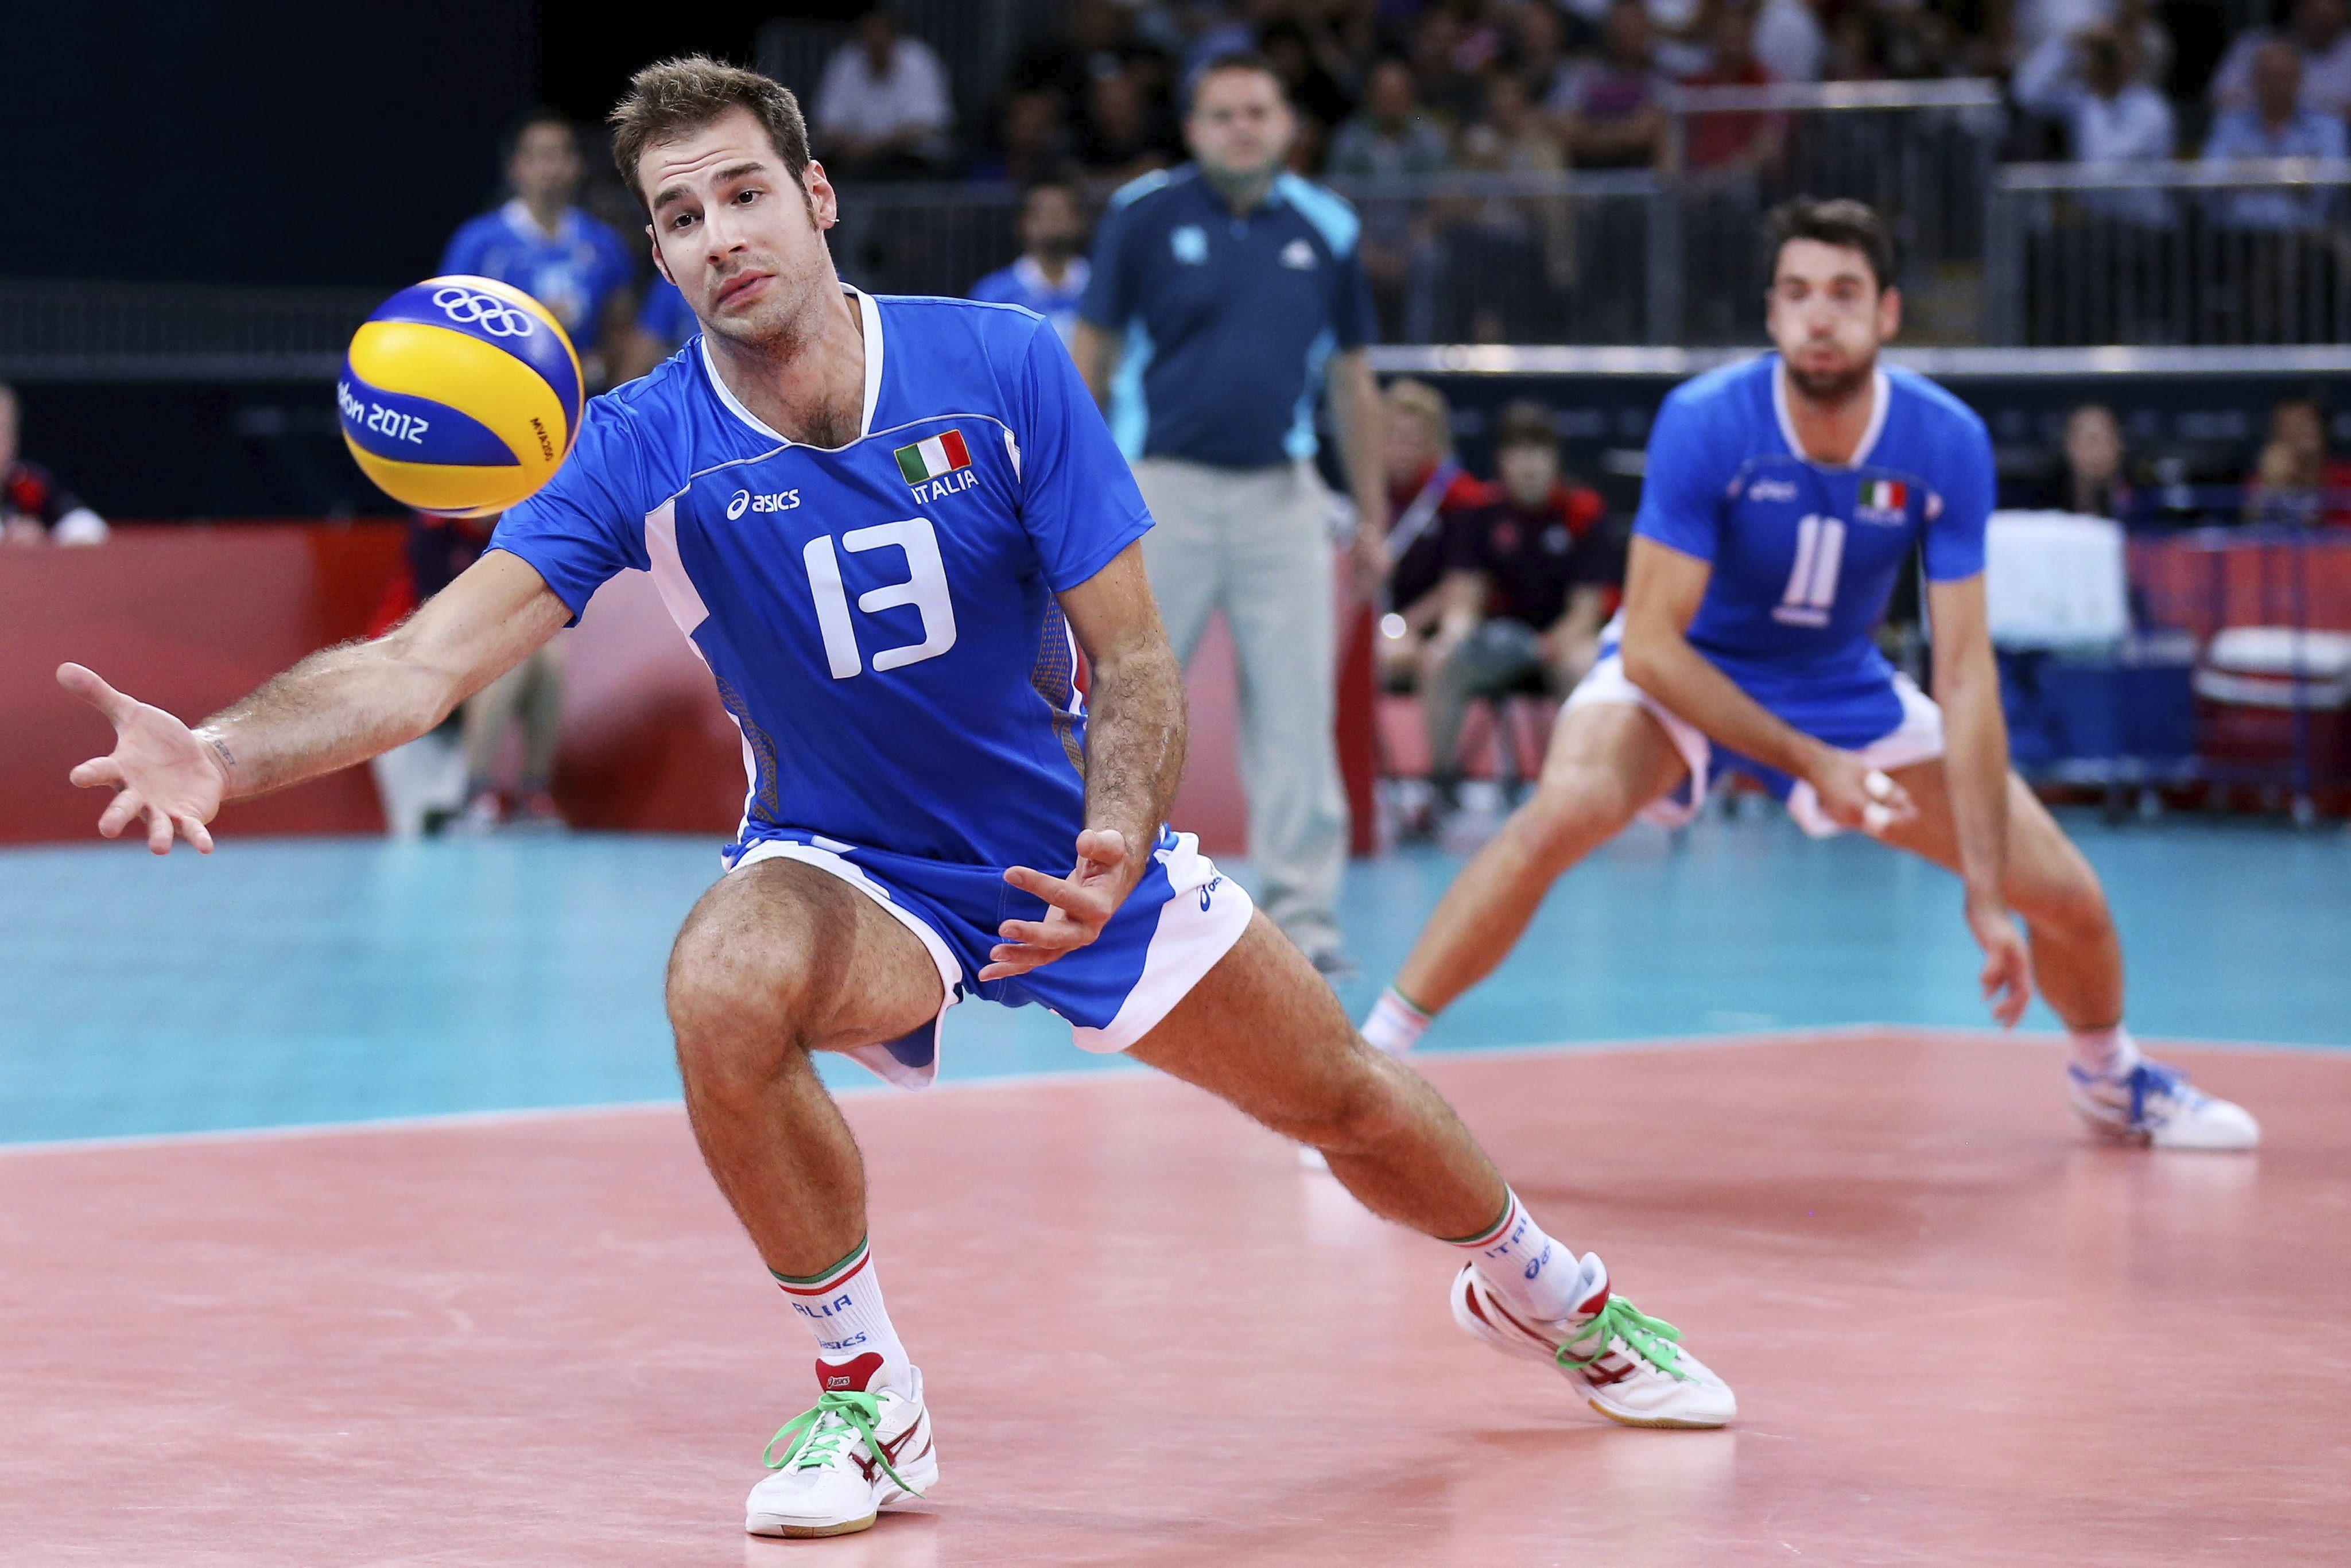 1-3. Italia se estrena con un triunfo sobre Bulgaria y complica a Argentina